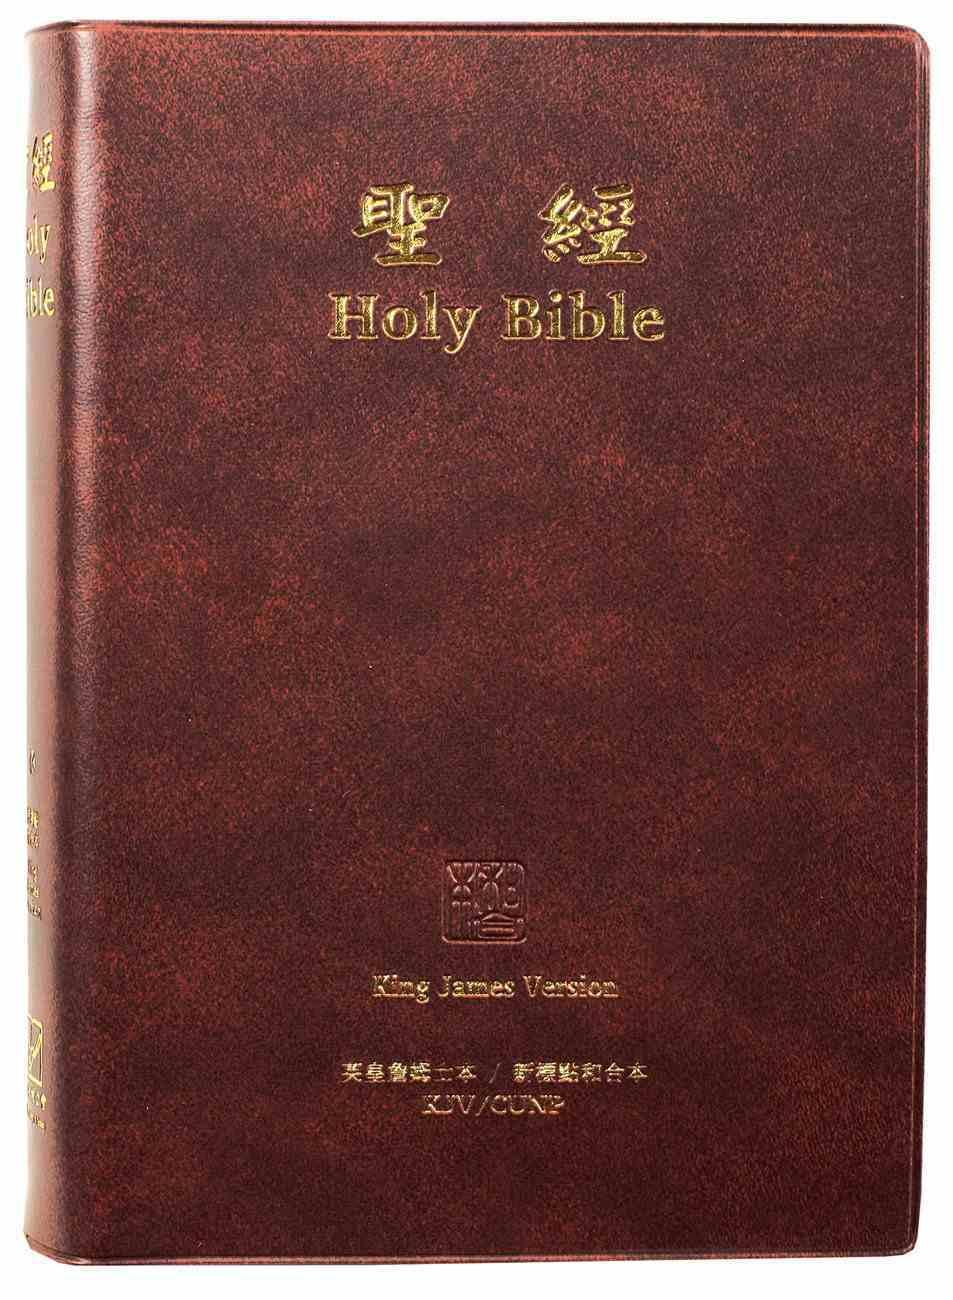 Cunp/Kjv Chinese/English Parallel Bible Brown Vinyl